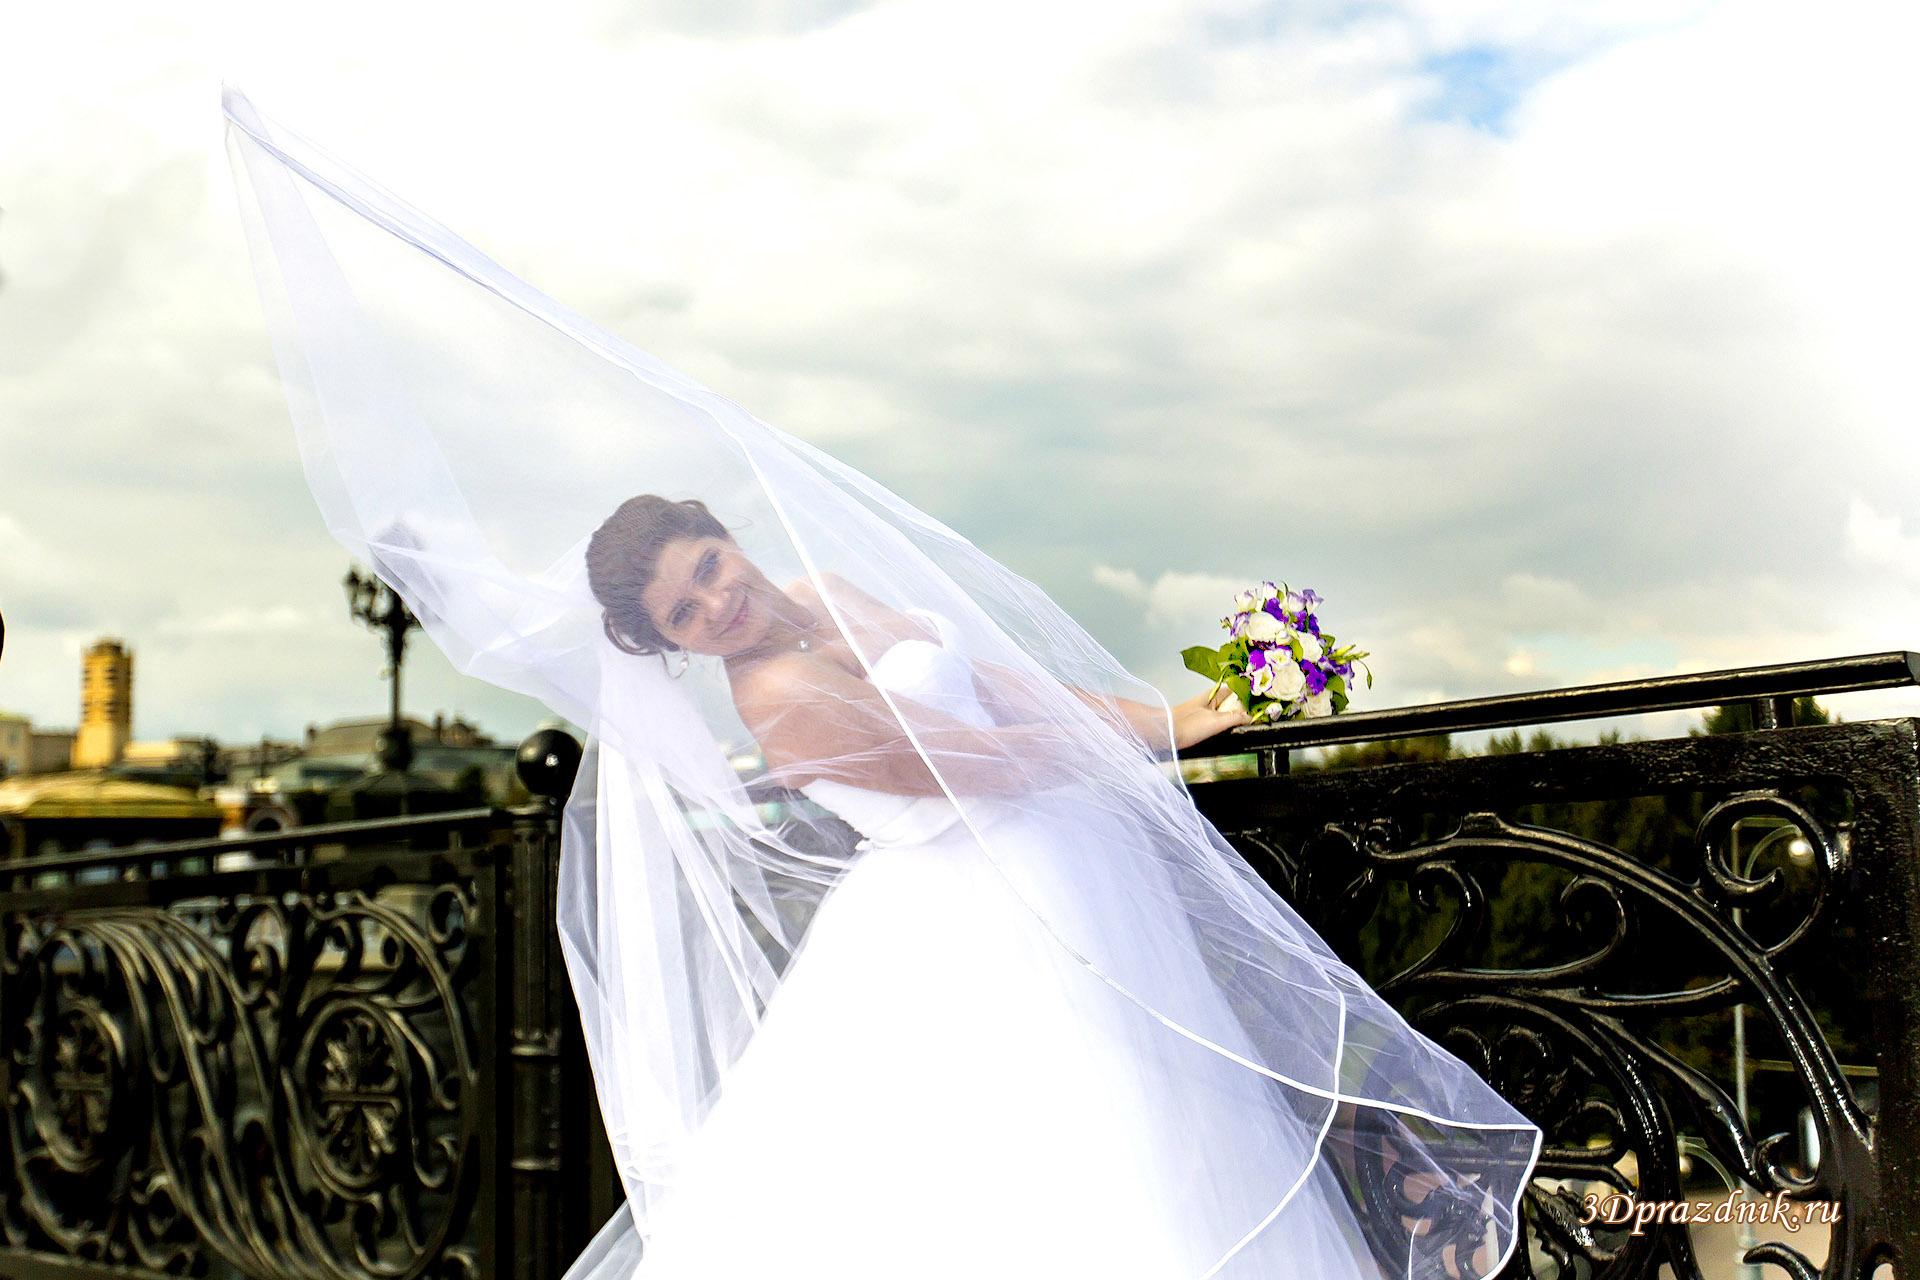 Невеста Ирина. За свадебной фатой.